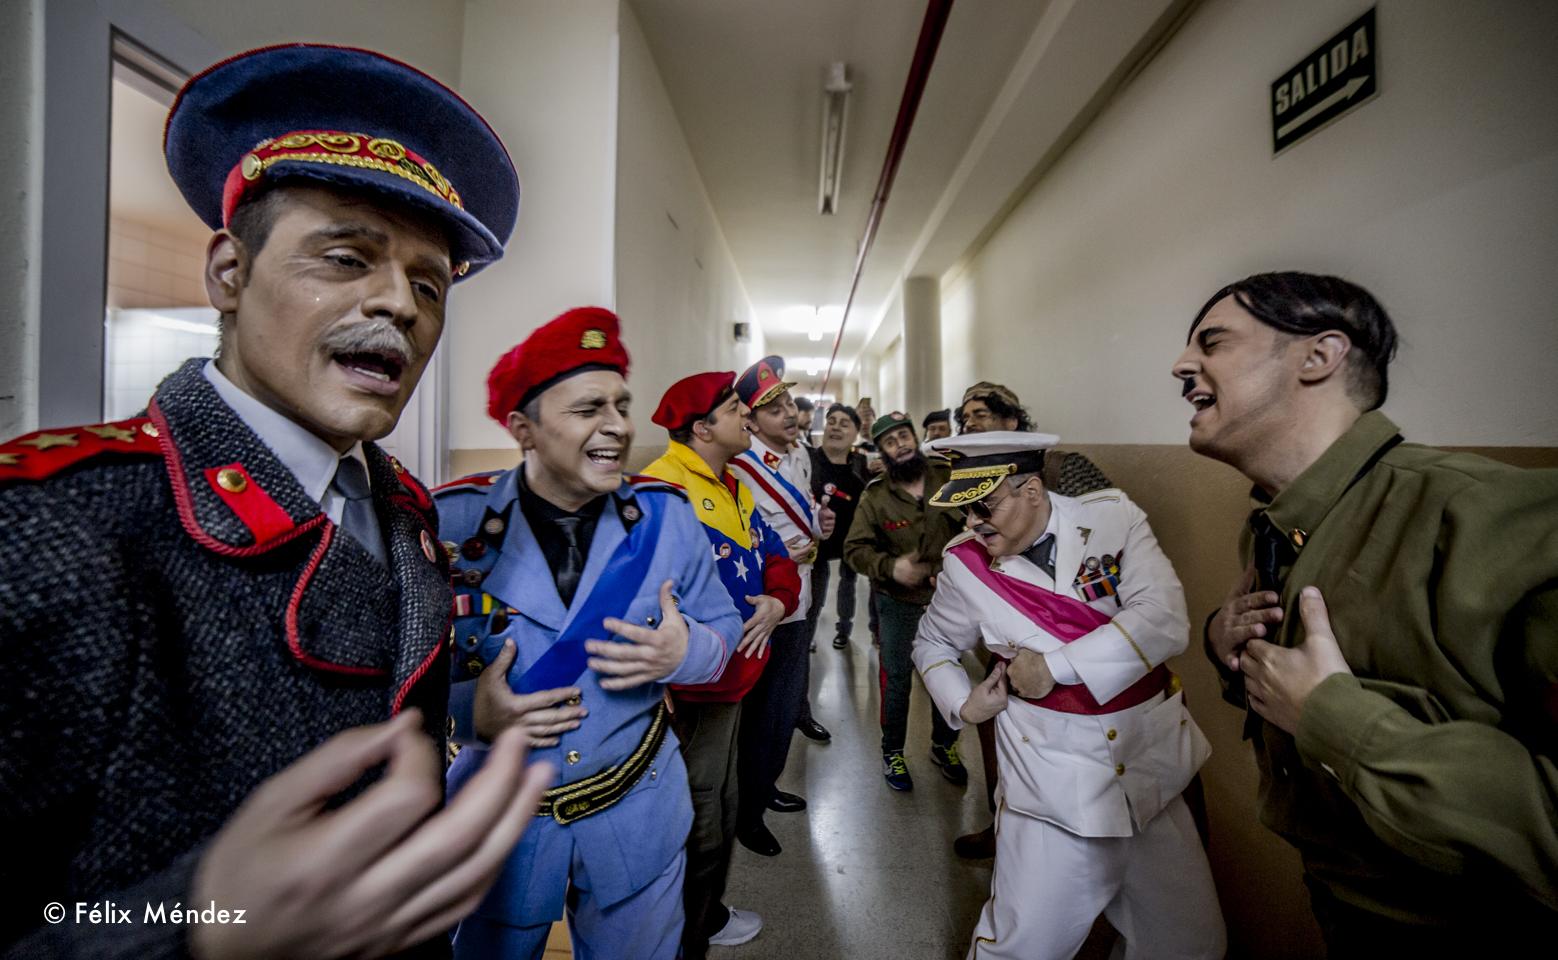 Carnaval-CULBA-culturabadajoz